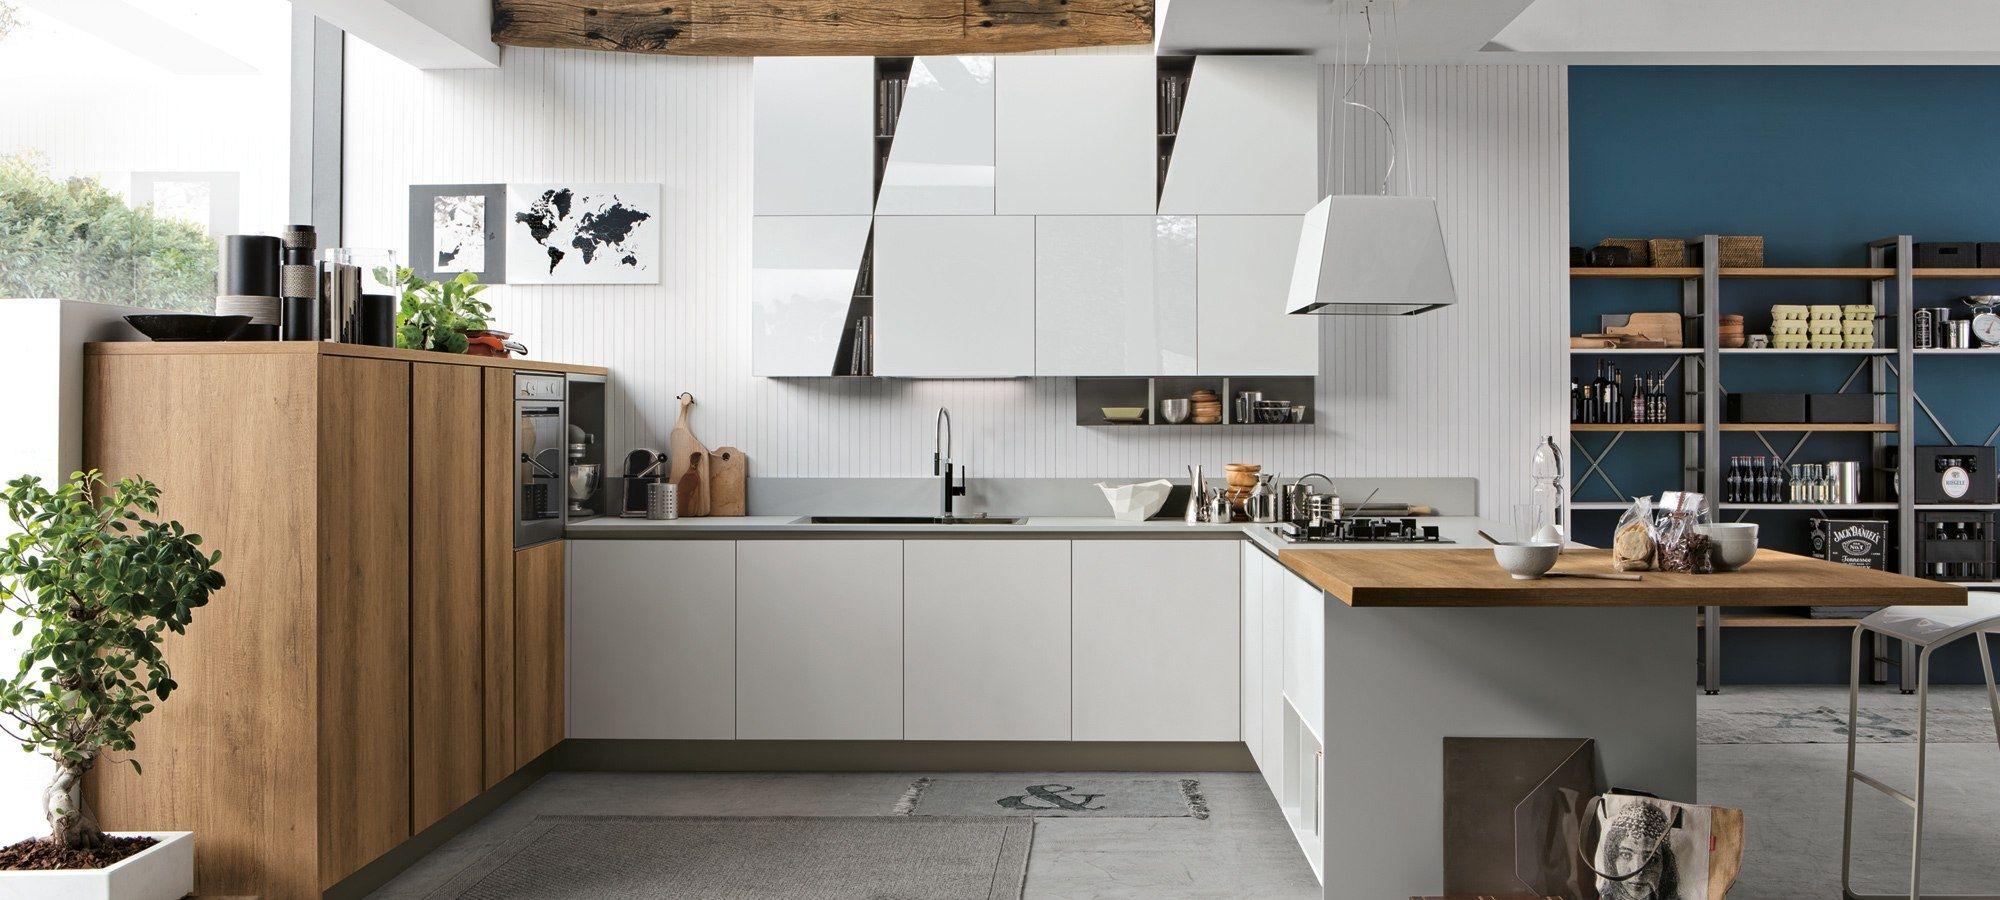 cucina Stosa Cucine Infinity composizione tipo 02 | Pinterest ...